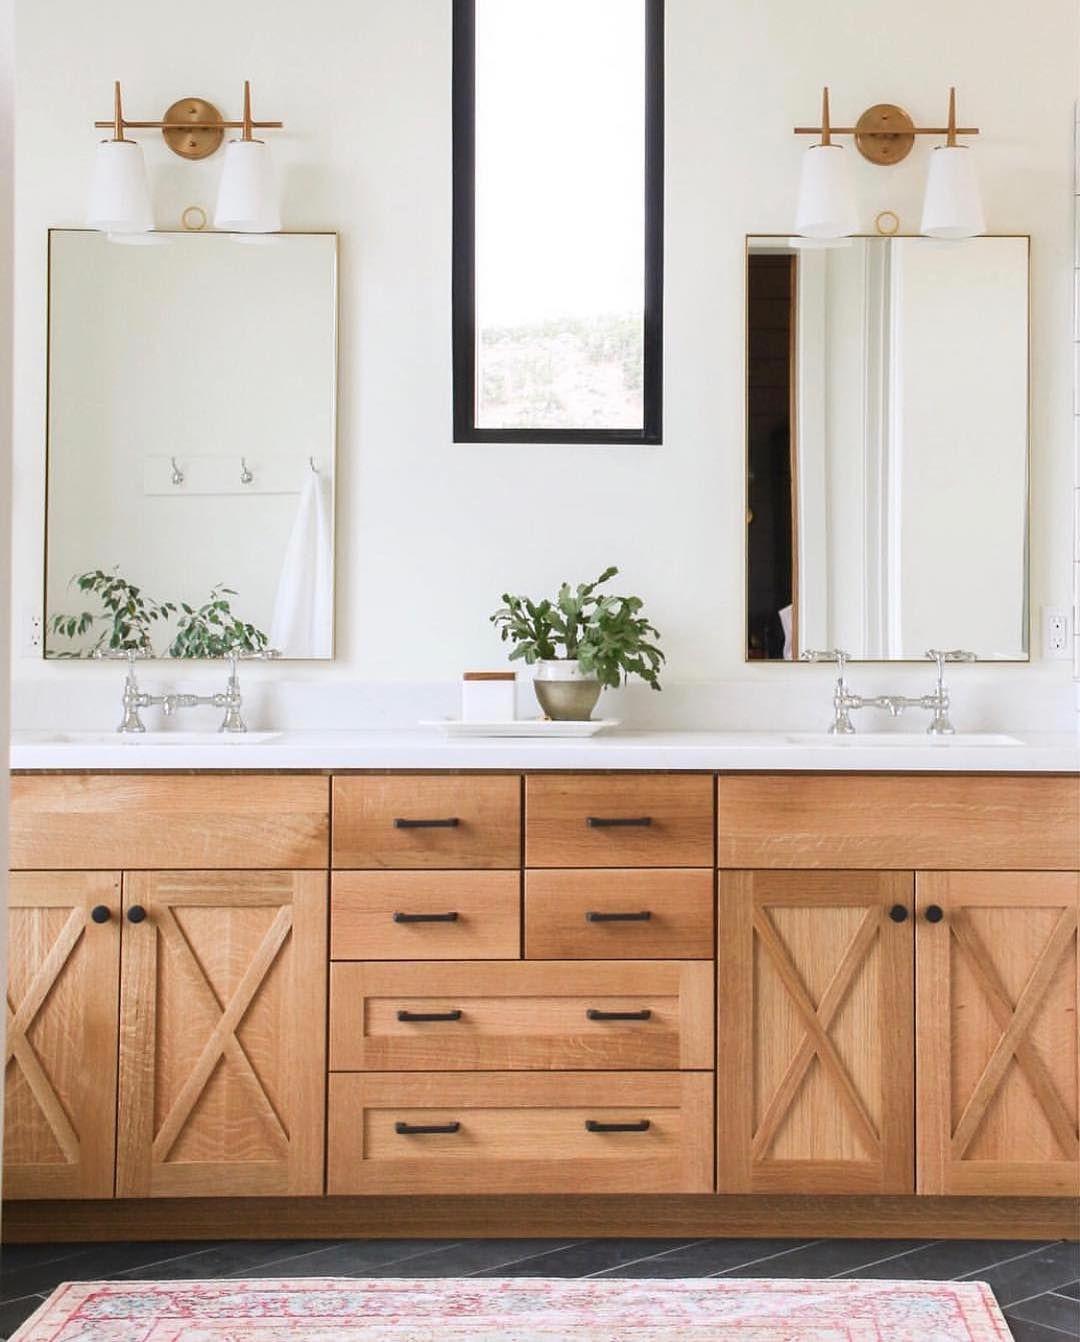 Vivir Design On Instagram Absolutely Loving This New Bathroom Design By Lindsay Hill Interiors New Bathroom Designs Bathroom Remodel Master Master Bathroom